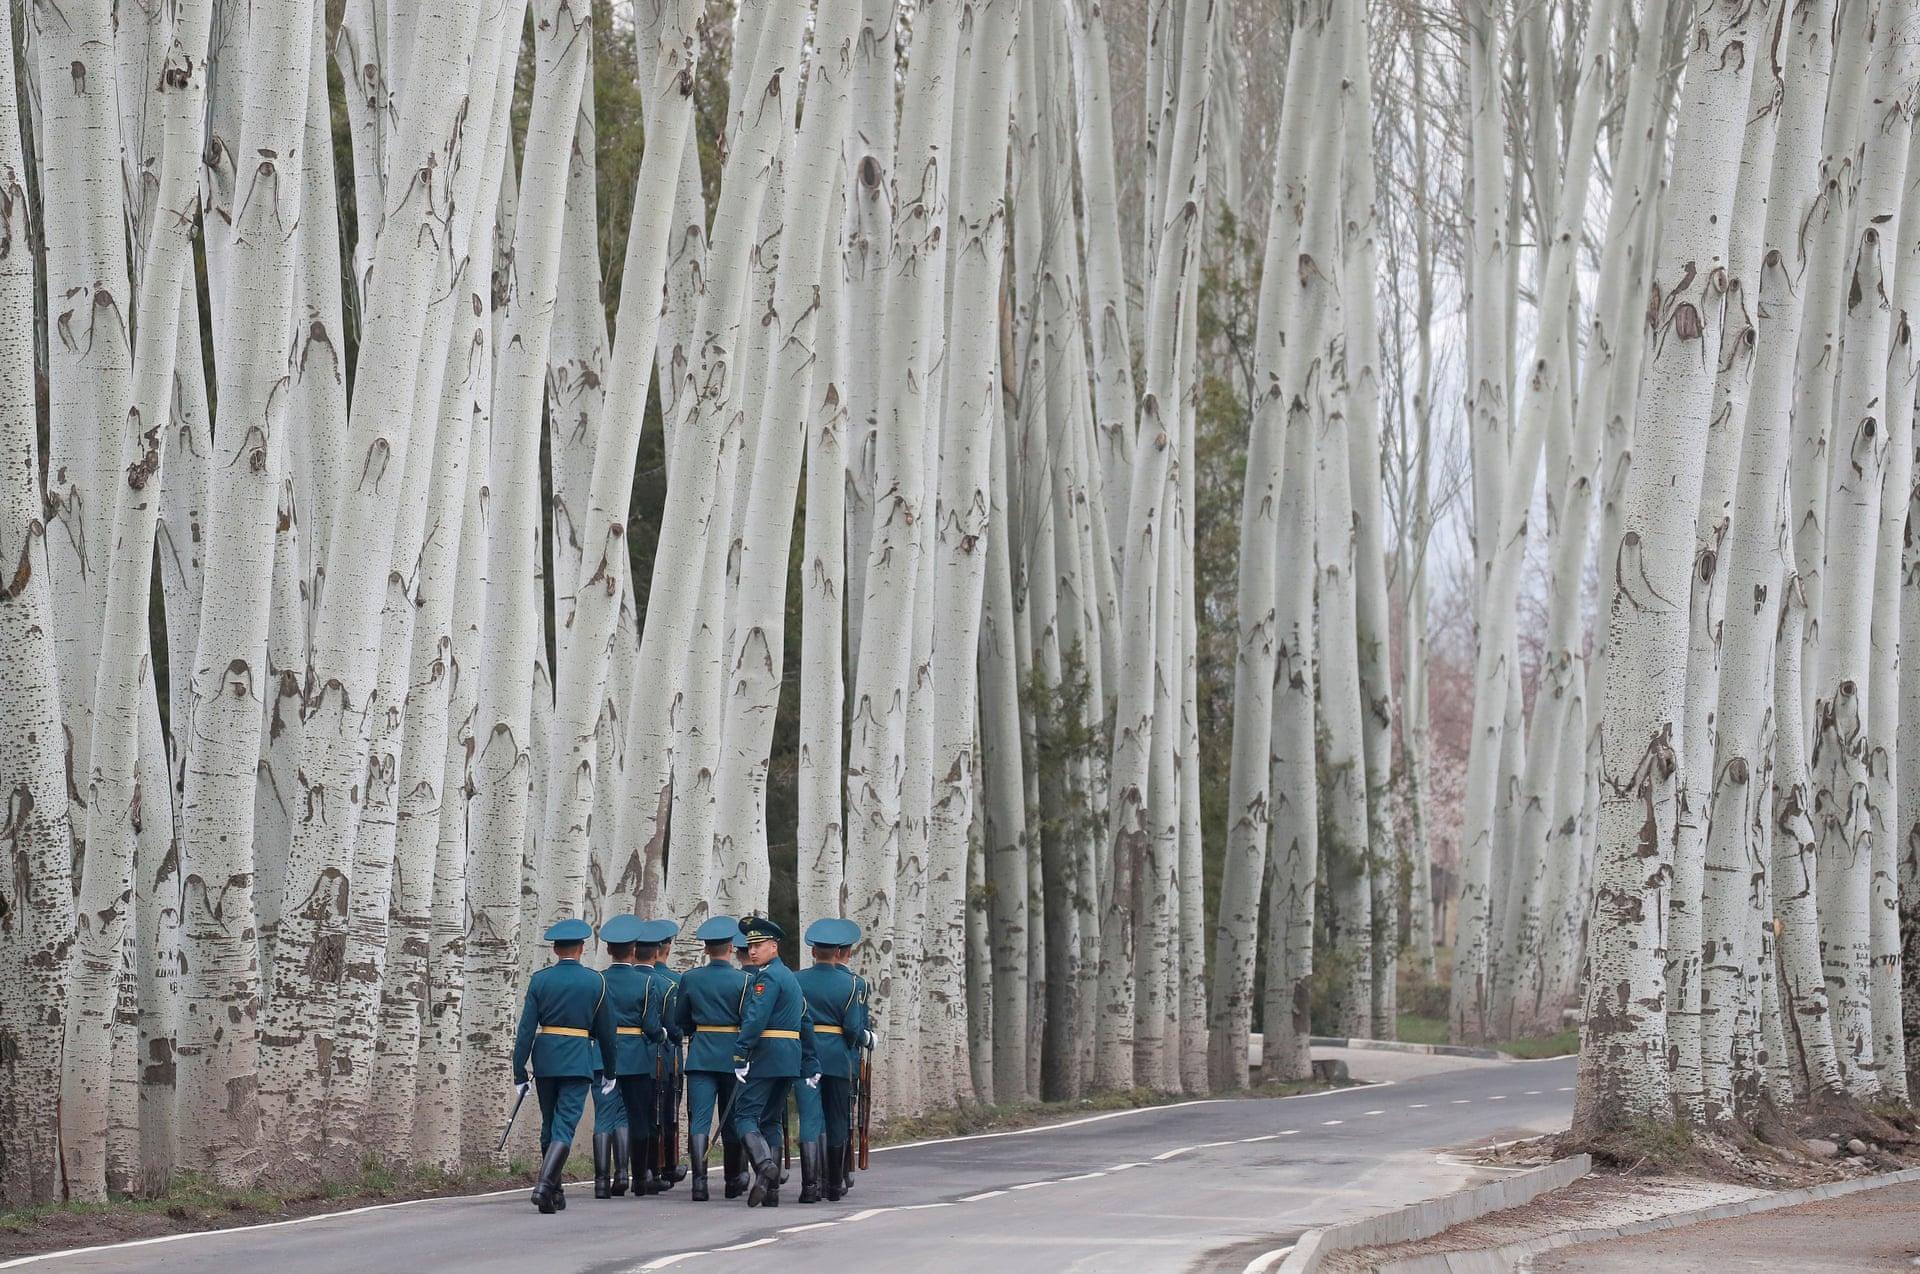 Maxim Shemetov/Reuters/Scanpix